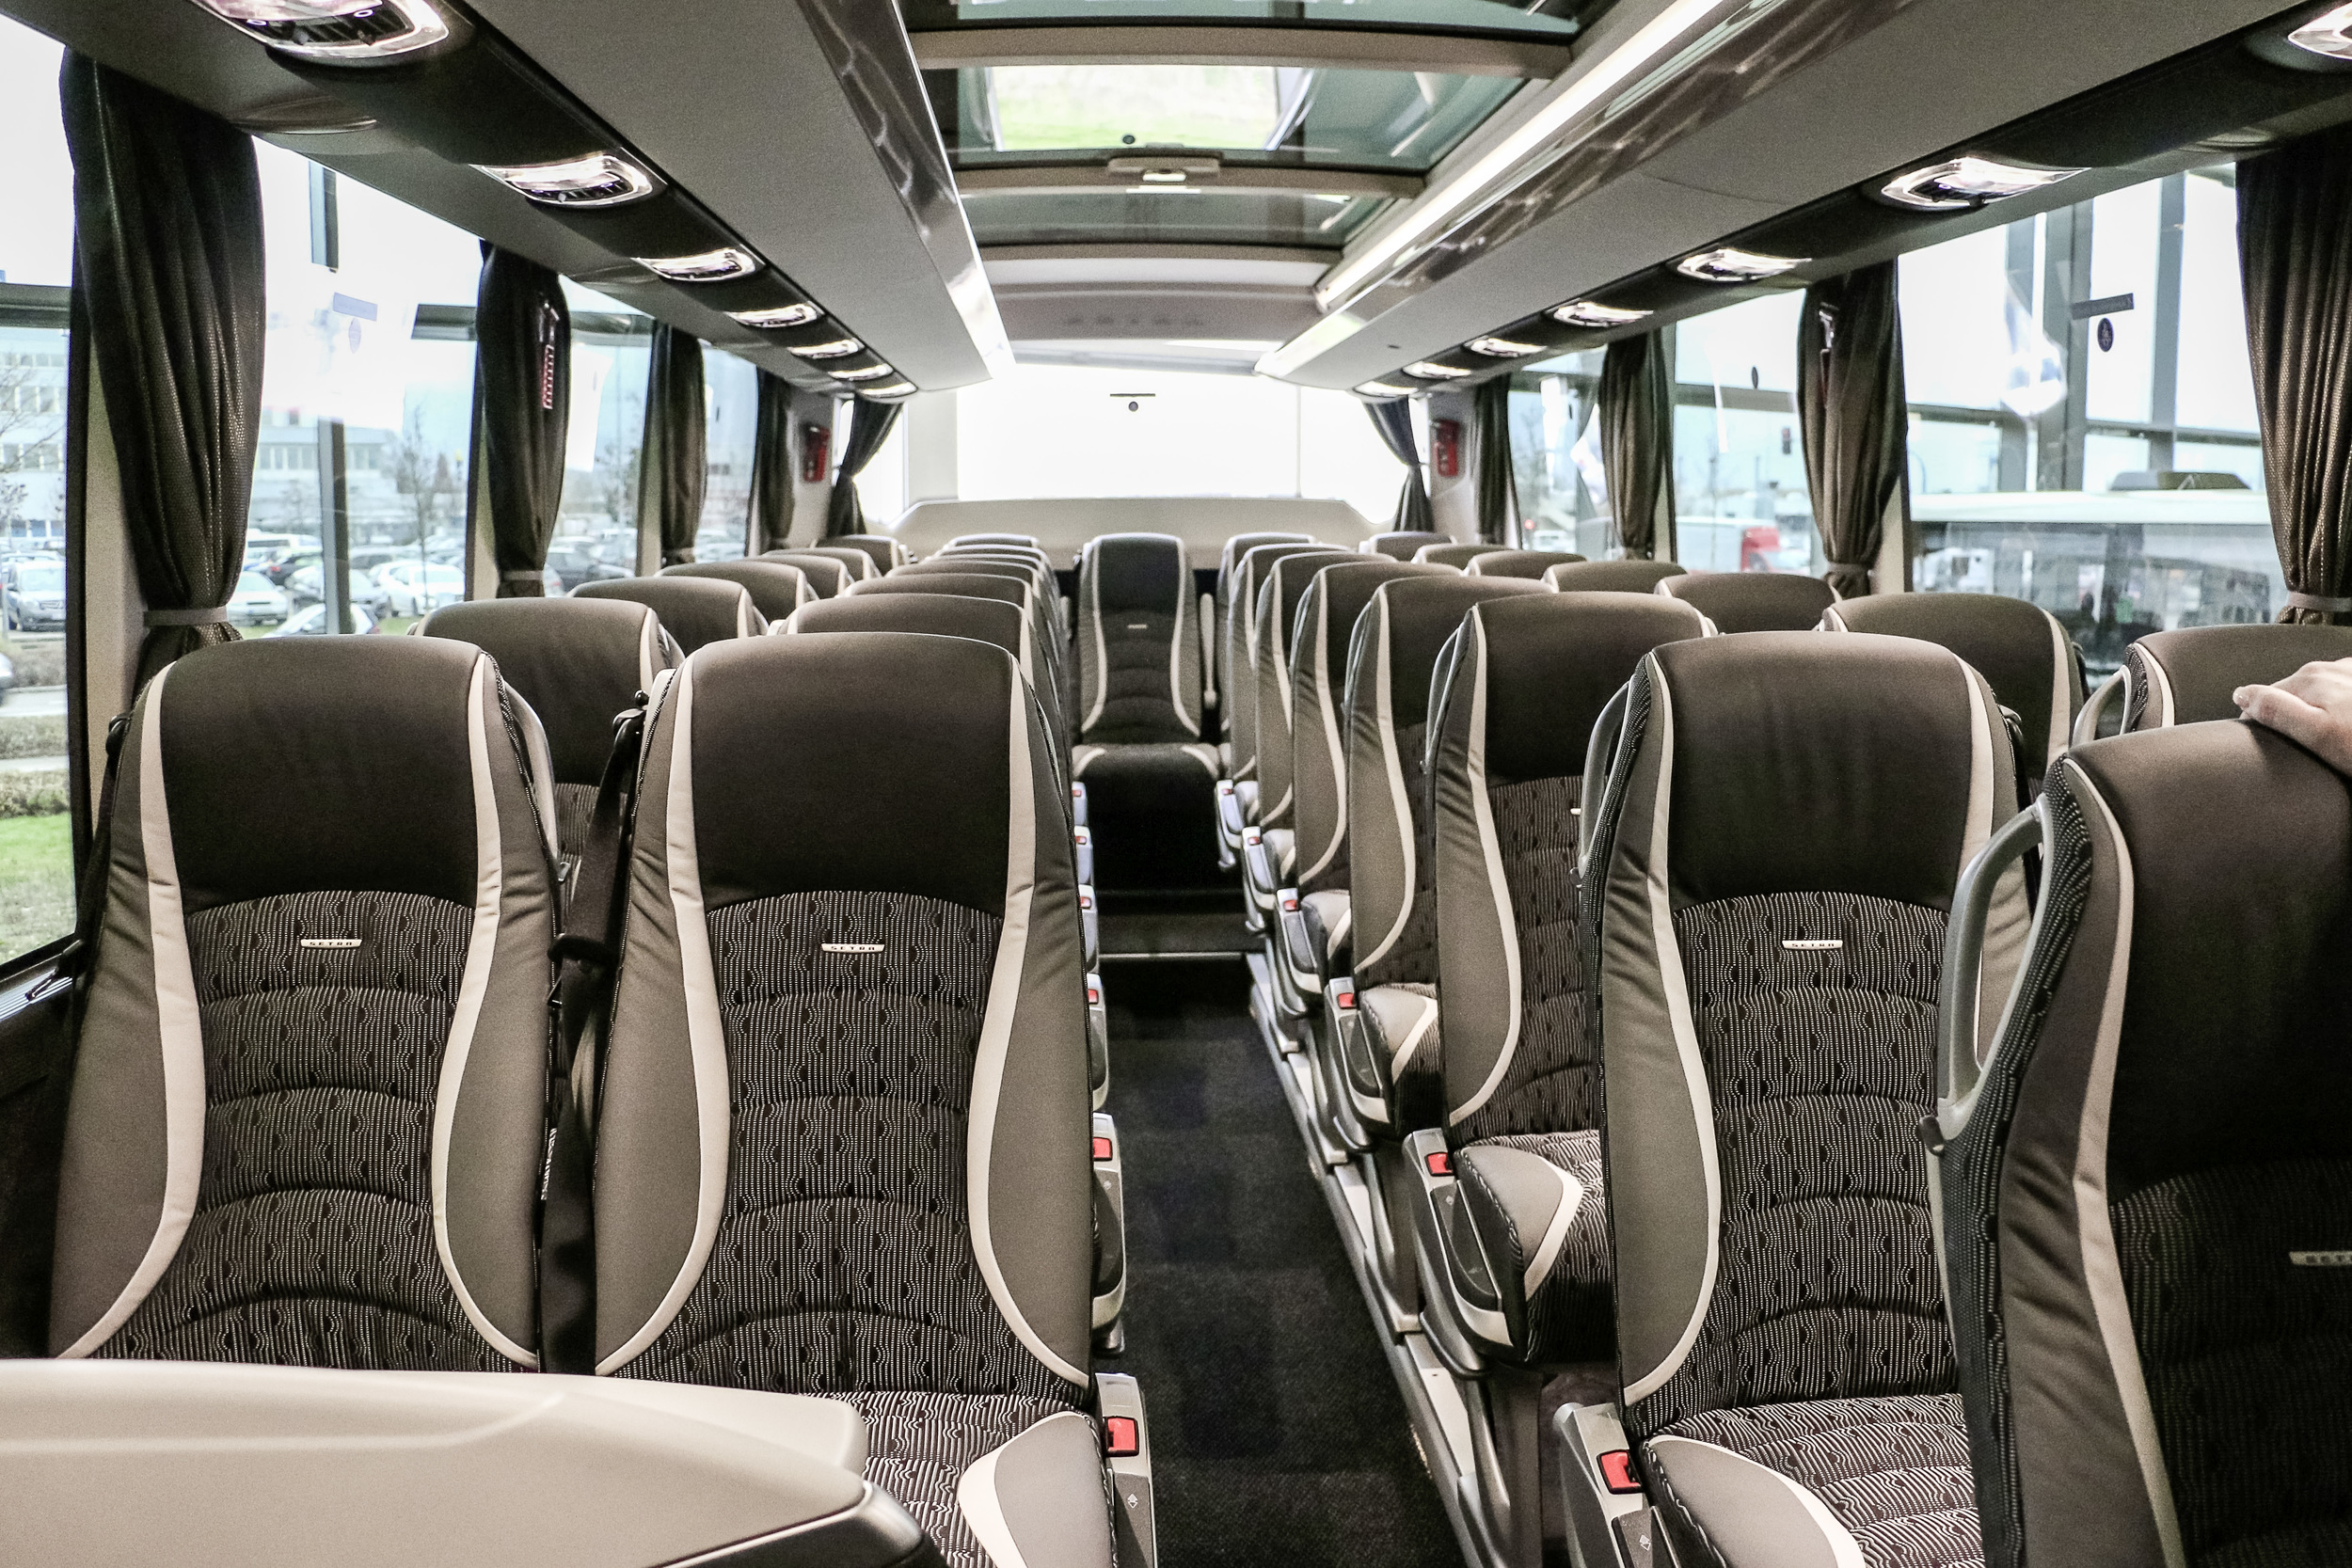 Interiér autobusu S 516 HDH portugalského dopravce Greenbus. (foto: EvoBus)